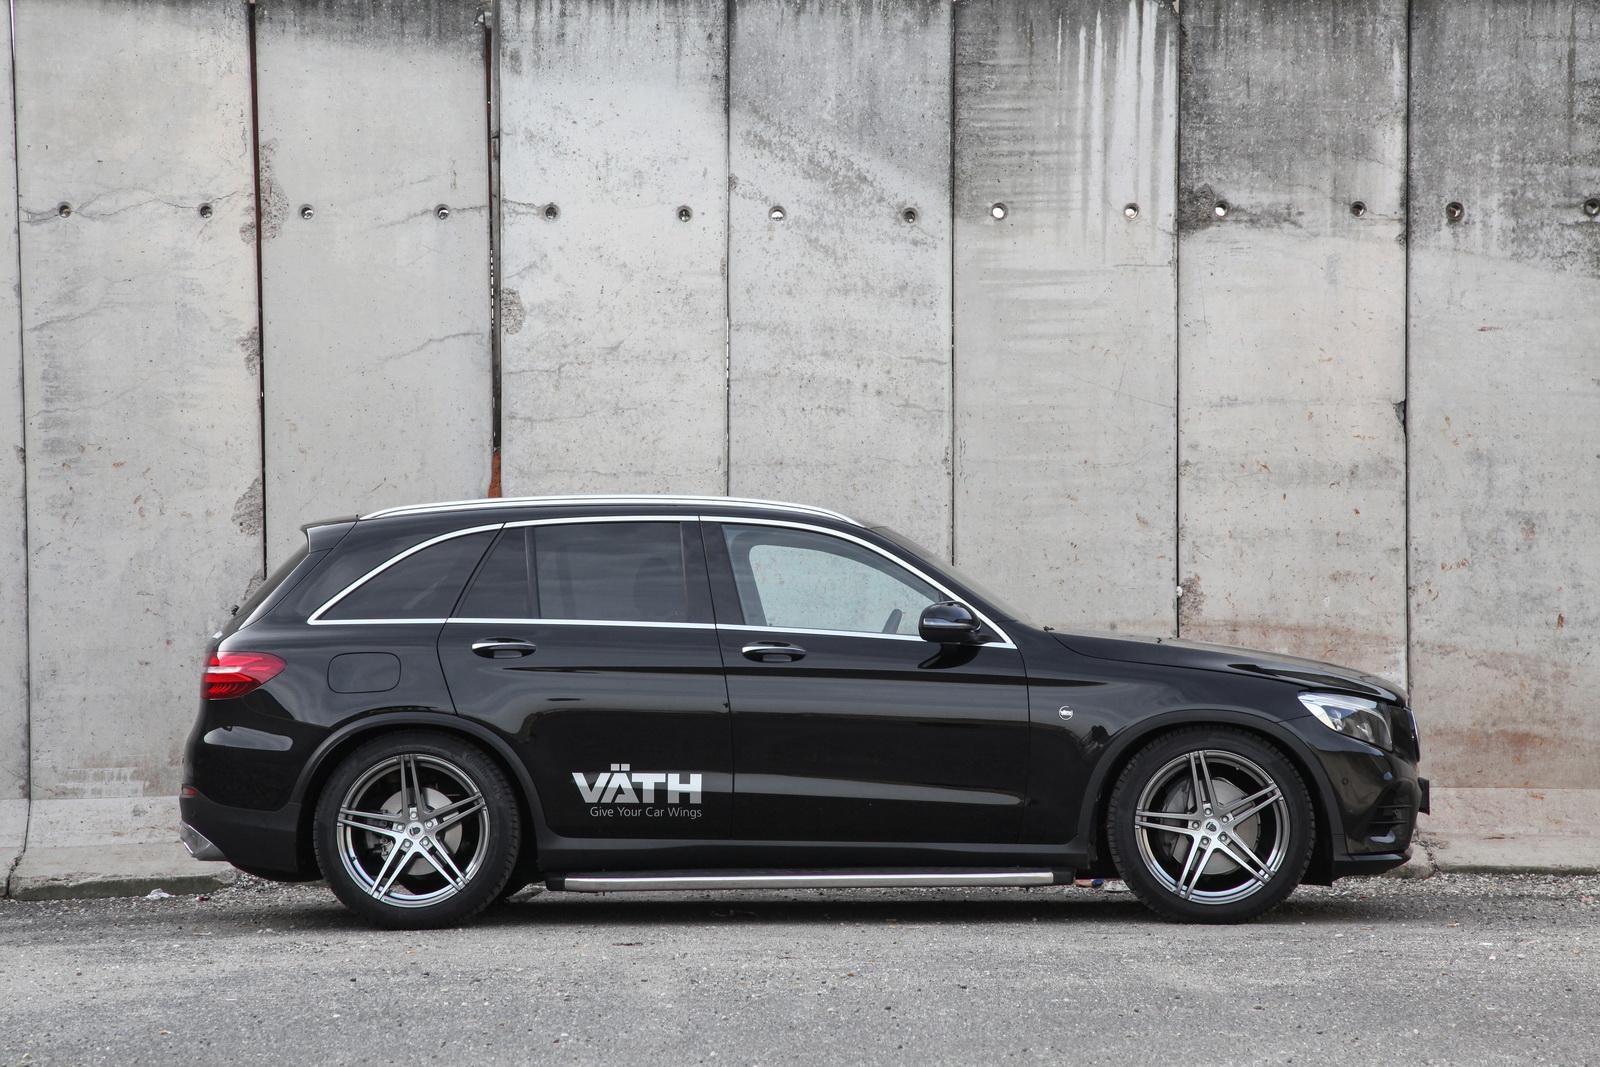 Mercedes_GLC220d_by_Vath_02